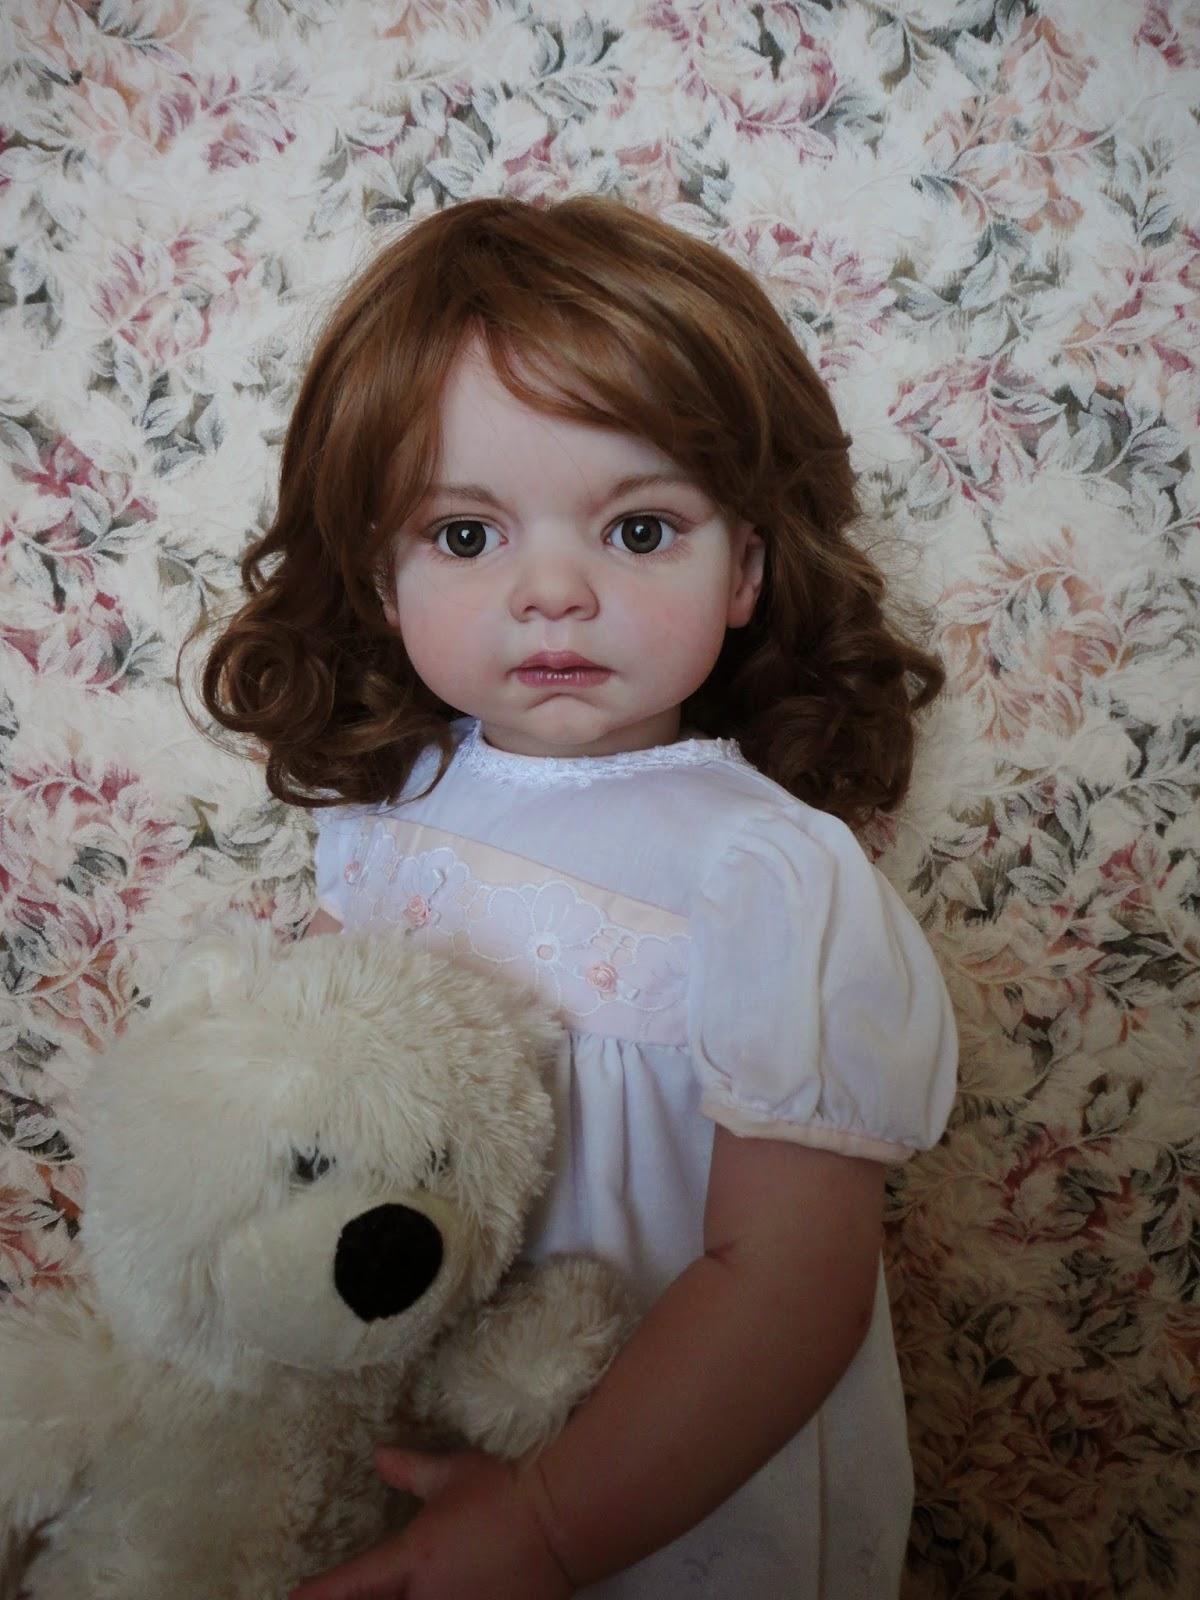 anya 39 s originals reborns and ooak art dolls beautiful reborn toddler portrait doll. Black Bedroom Furniture Sets. Home Design Ideas